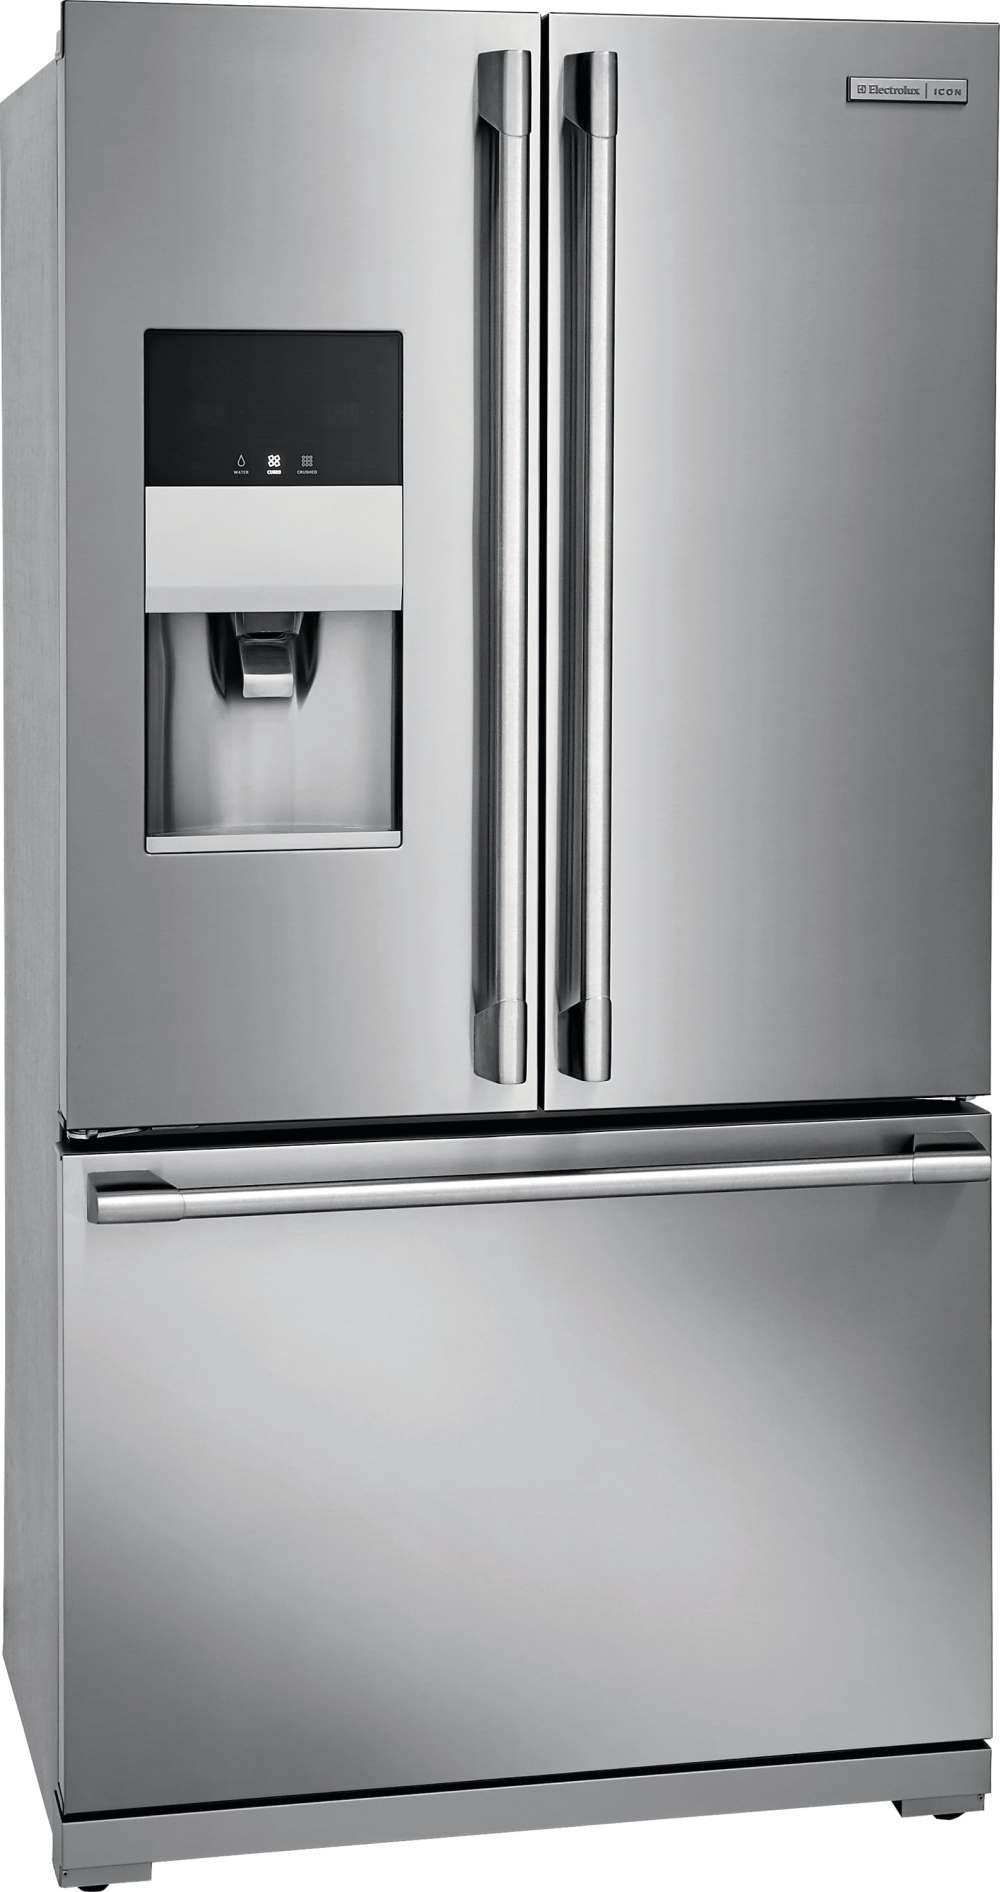 medium resolution of electrolux icon french door refrigerator